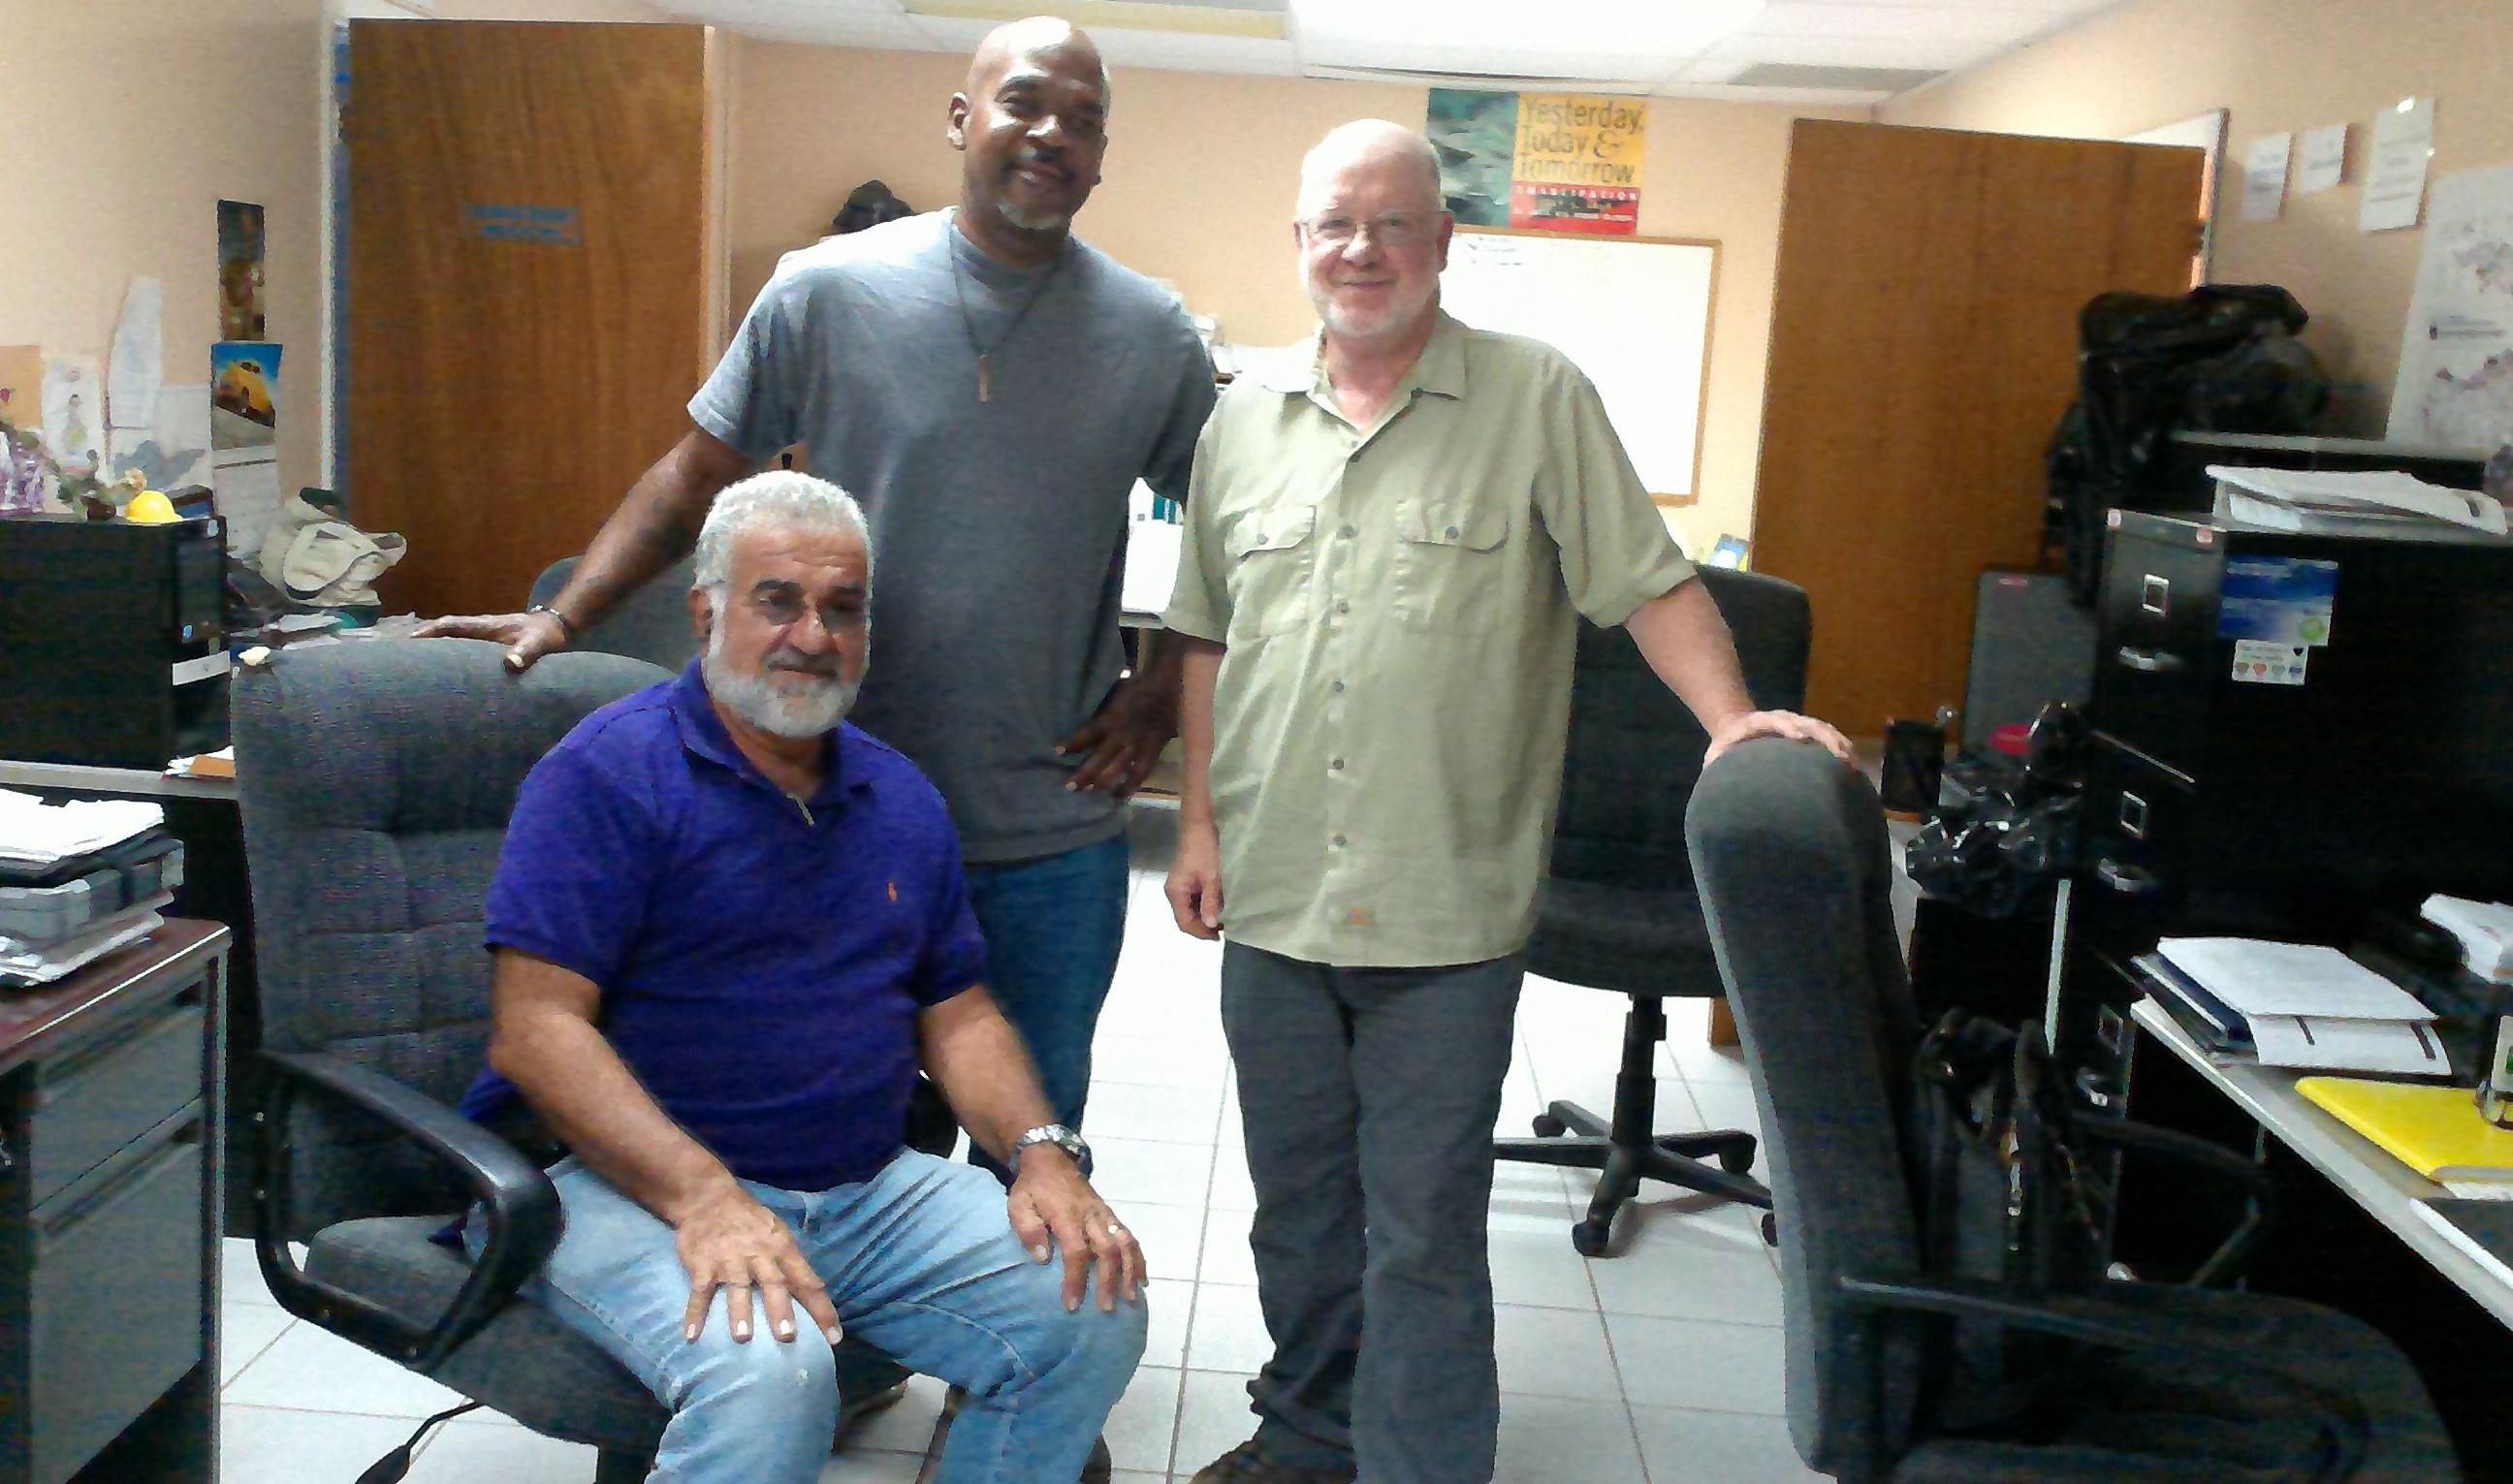 Building inspectors Alexis Doward (top left), John Flumerfelt (top right) and Leonard Ferrante (seated)